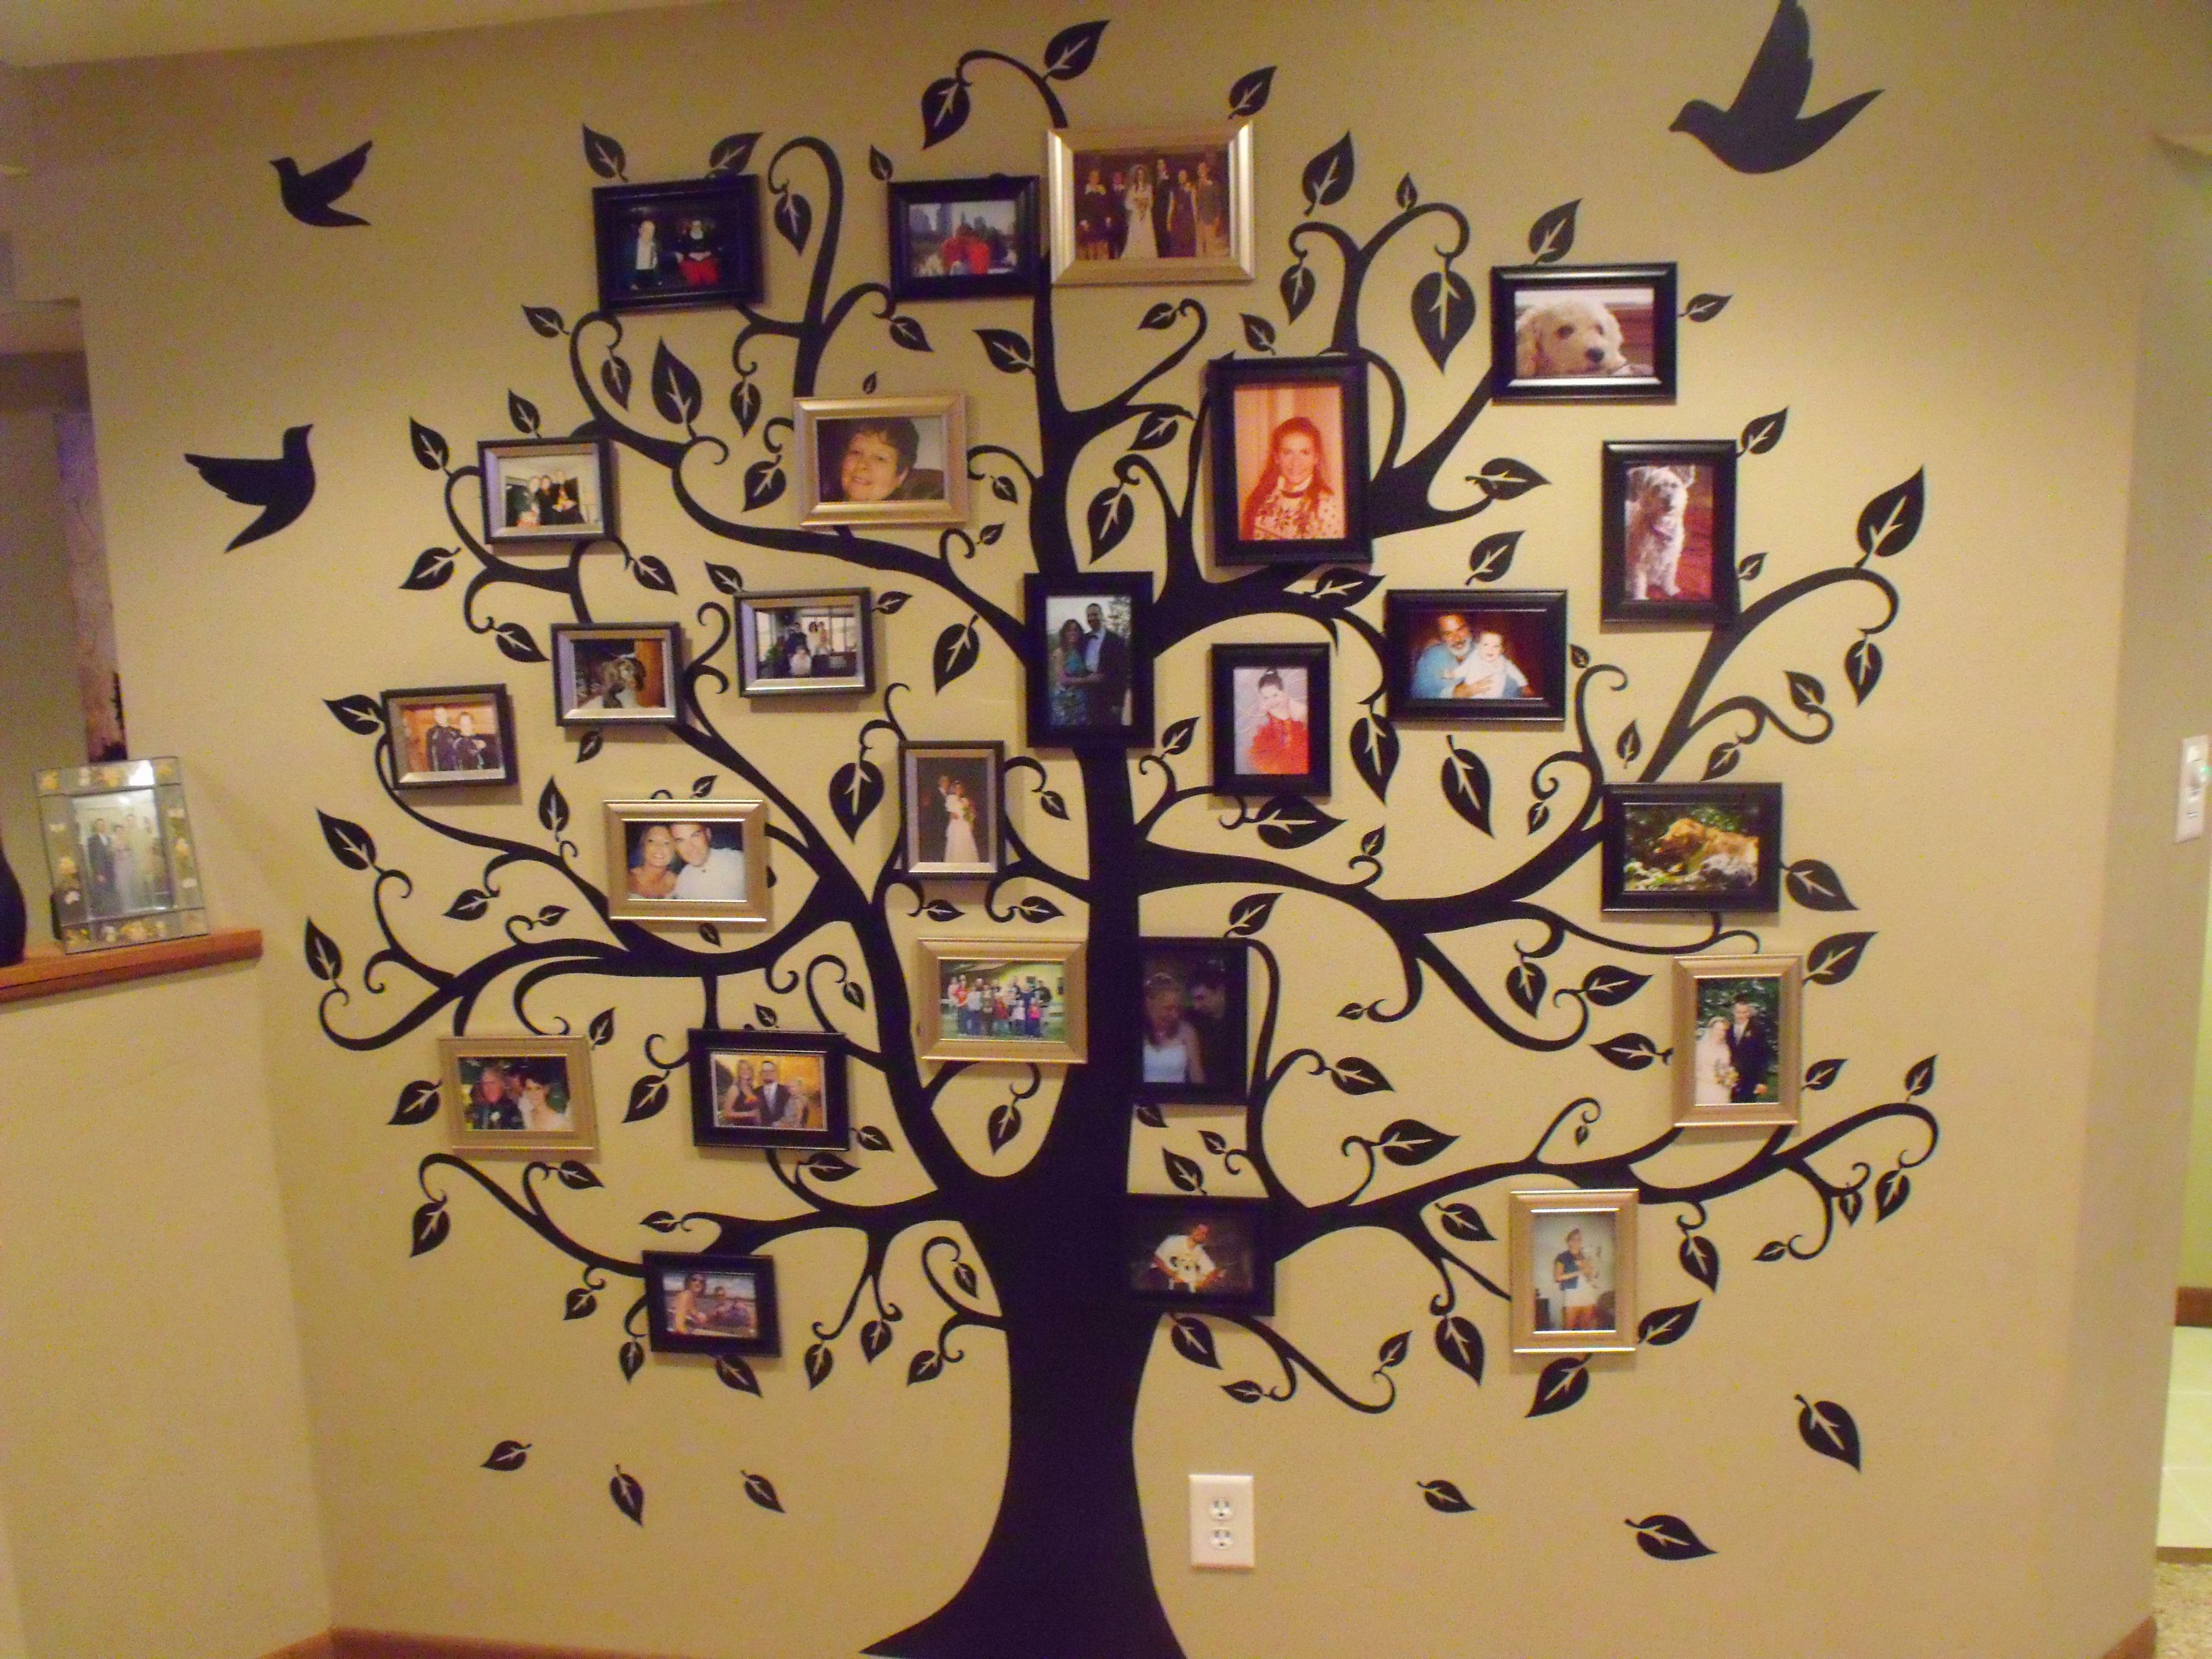 Vinilo rbol geneal gico vinilos decorativos originales for Mural una familia chicana